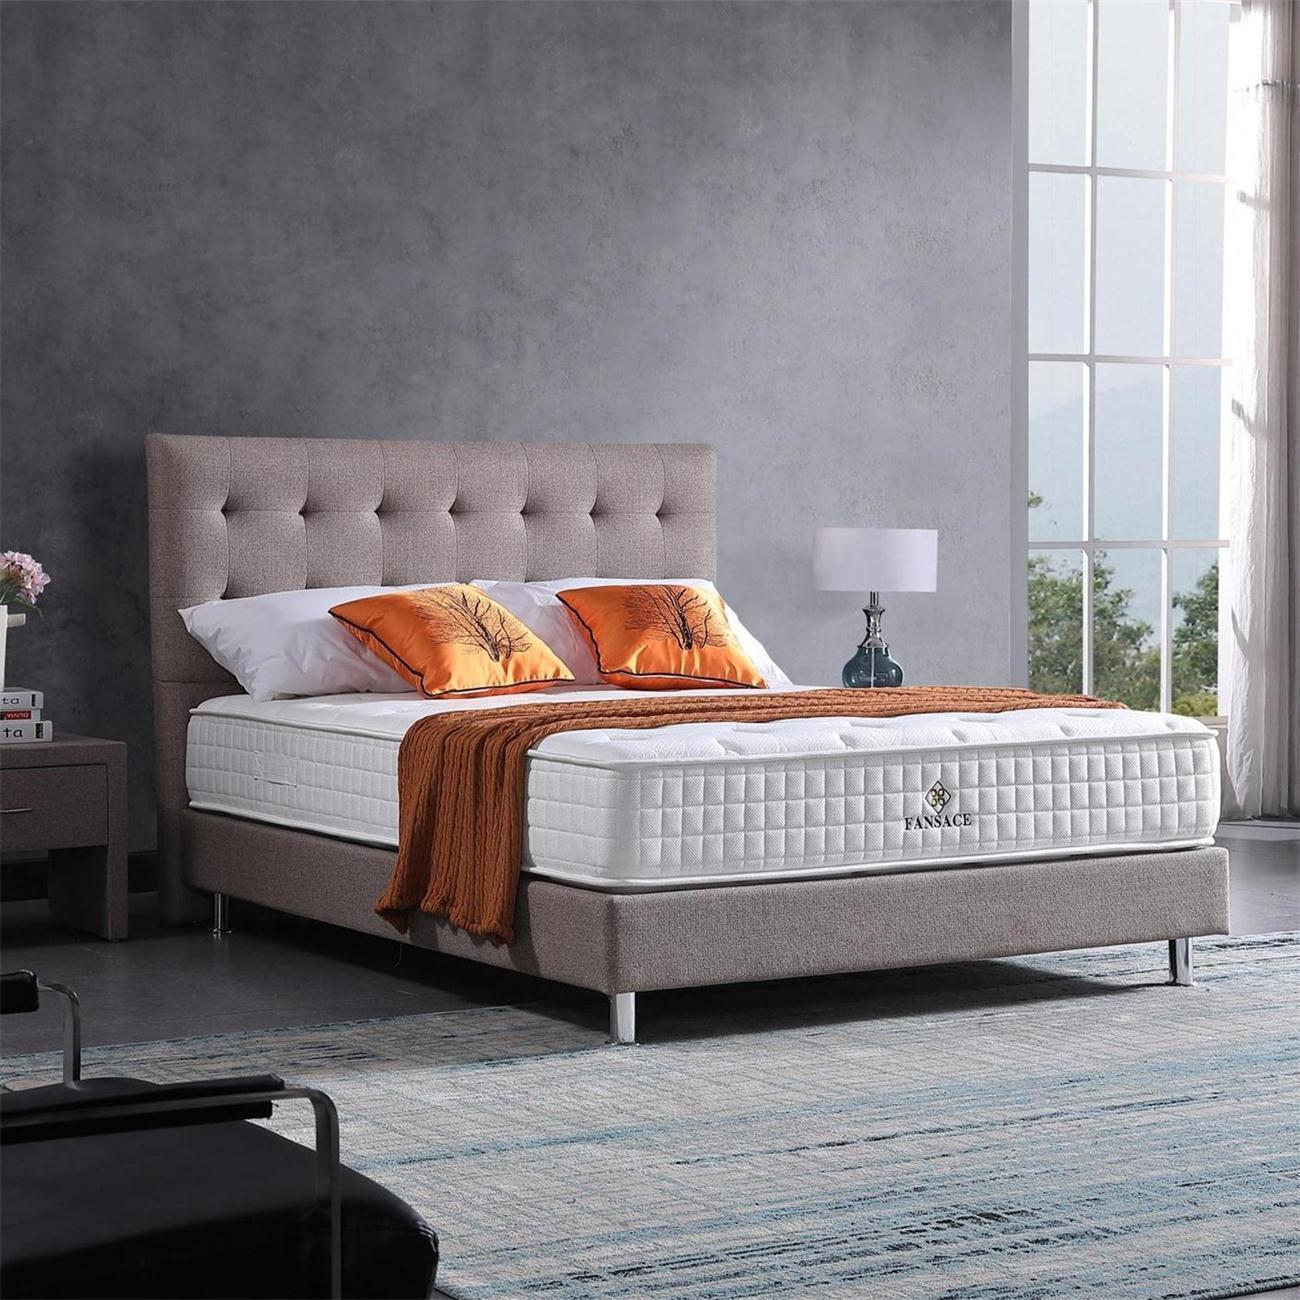 Fansace 21BA-01 Hotel-Grade Mattress With Bonnel Spring Structure Soft Hardness